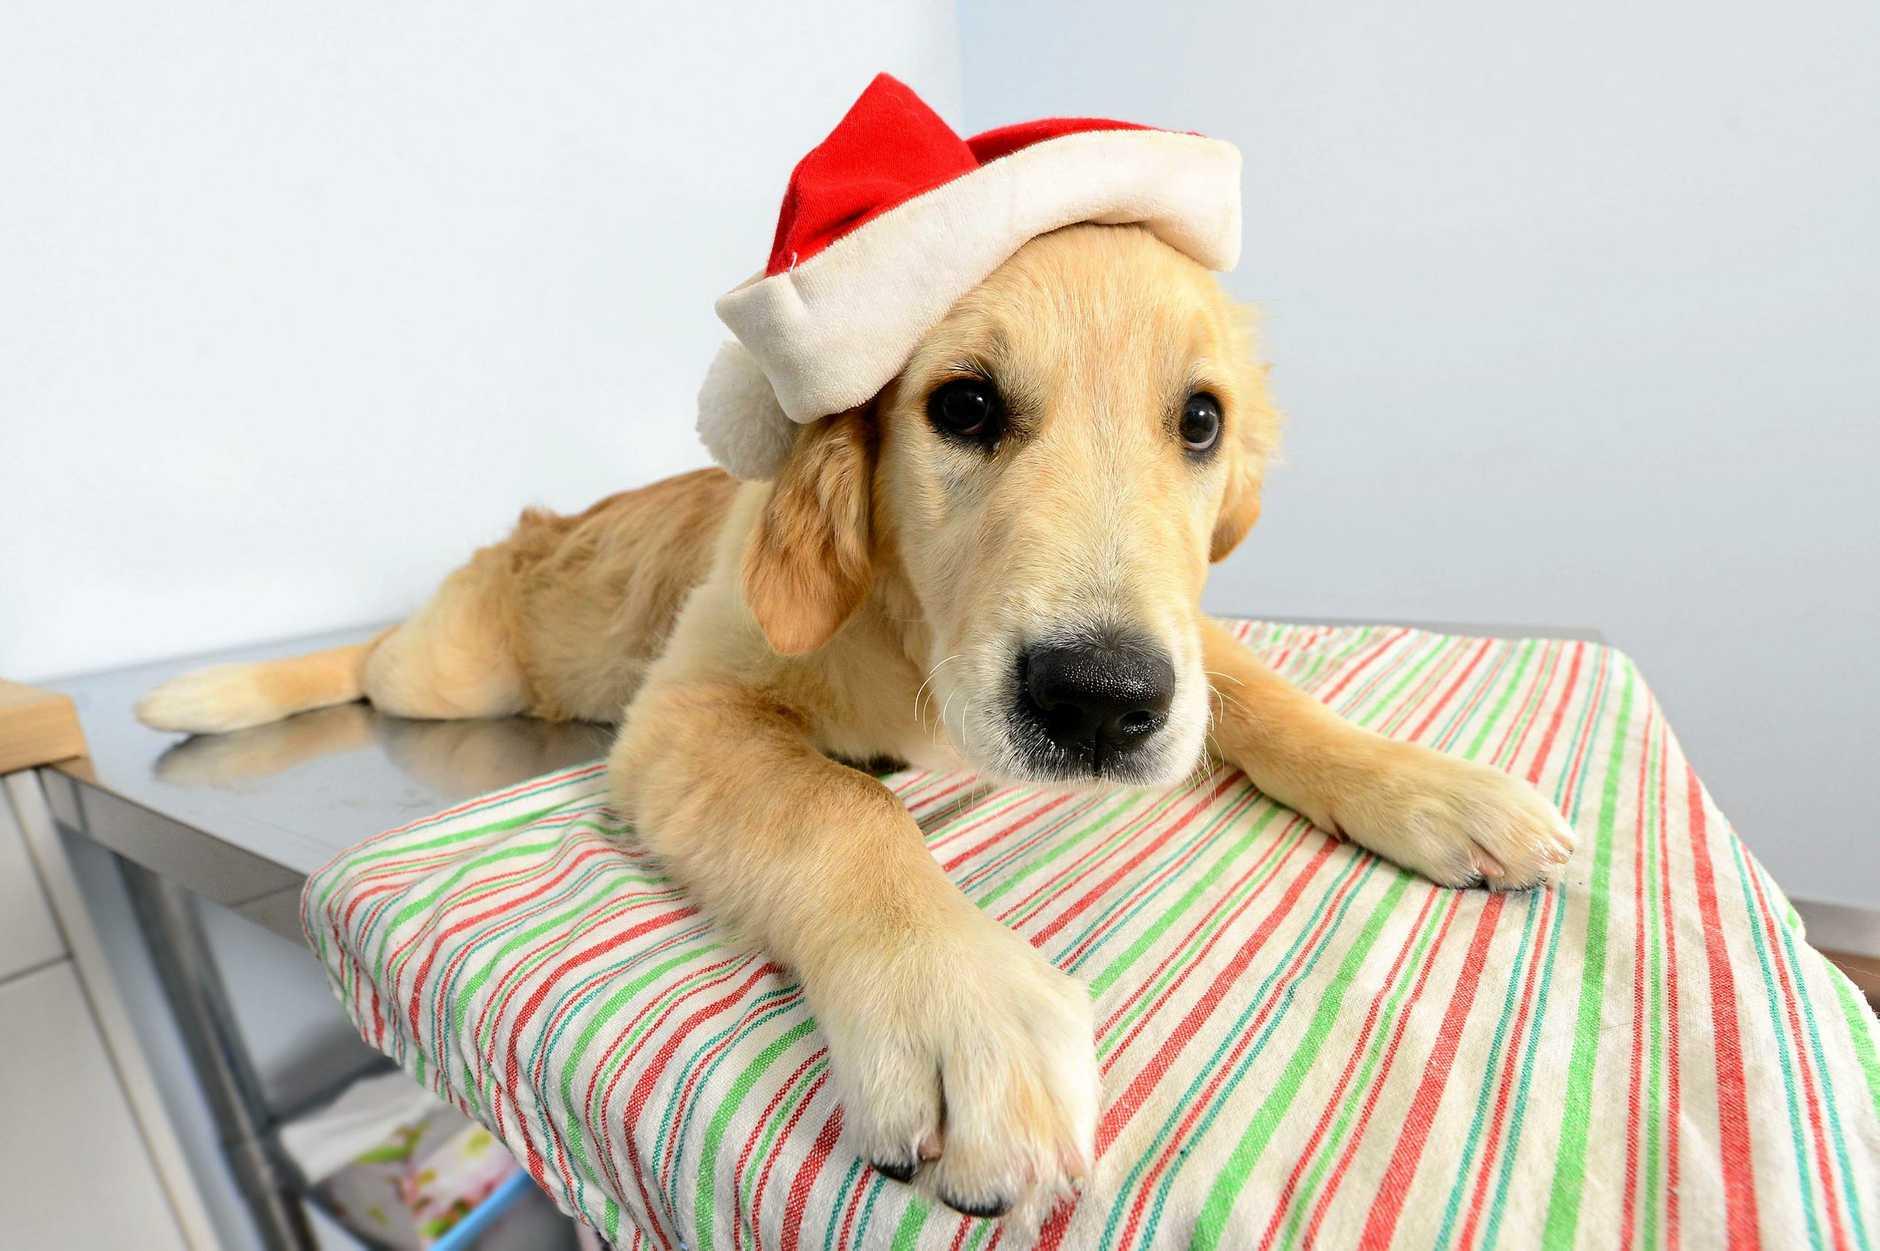 CUTE: 17-week-old Labrador puppy Indigo gets in the Christmas spirit.